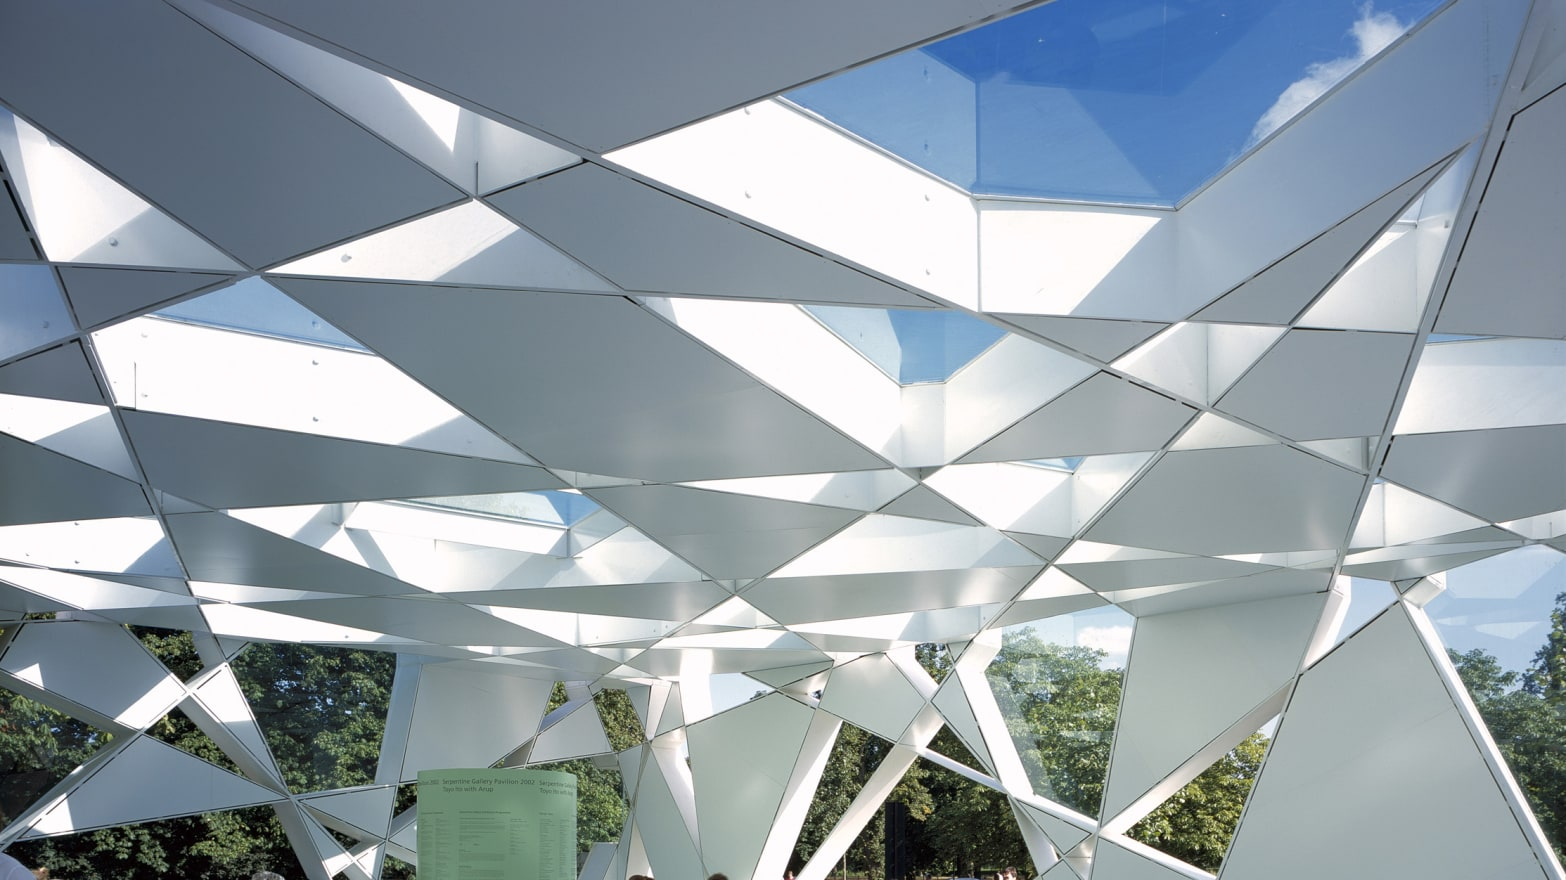 Pritzker Prize Winner Toyo Ito's Architecture Masterpieces (PHOTOS